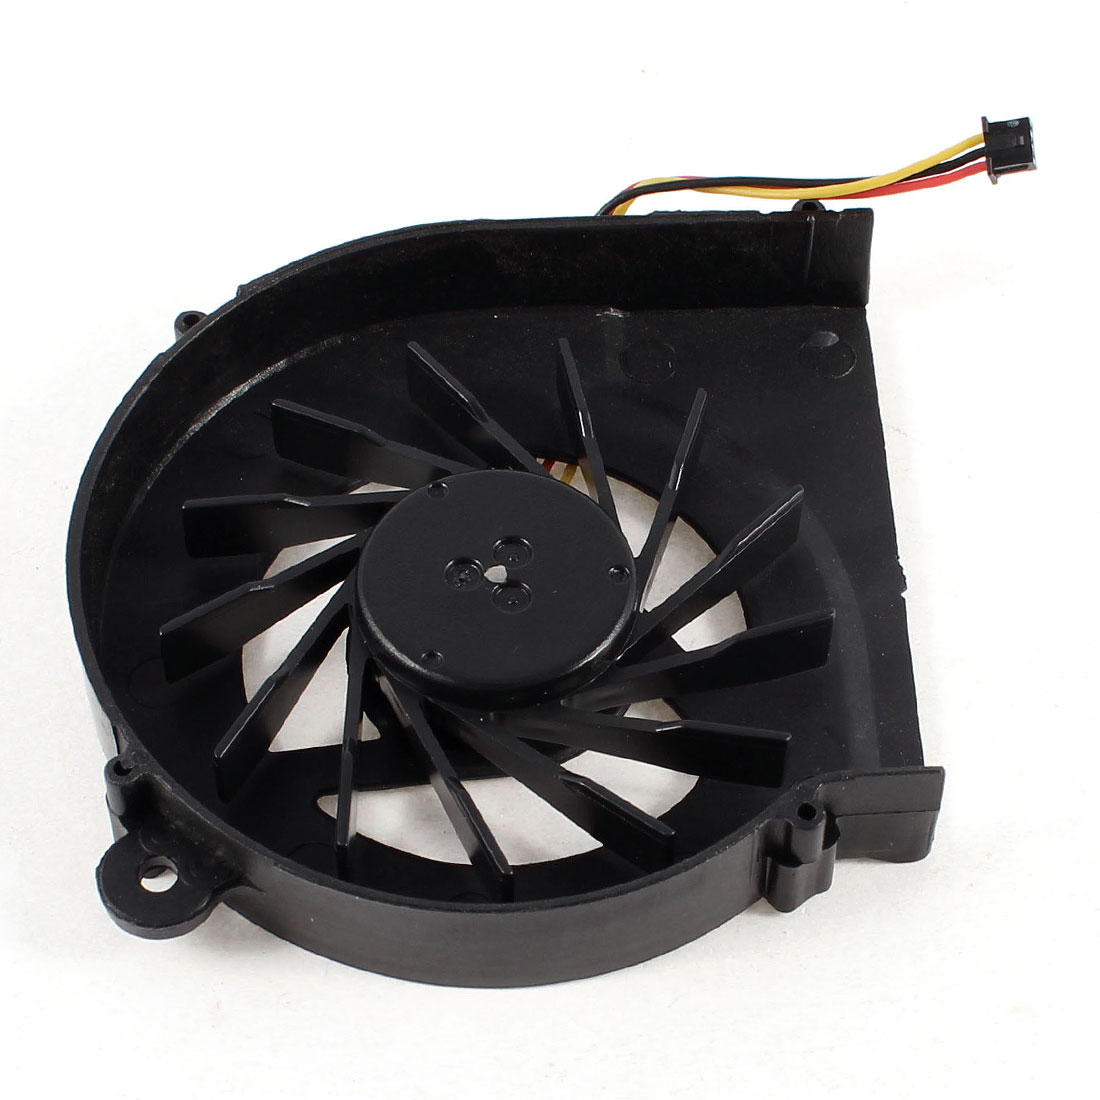 PC Laptop CPU Cooling Fan KSB06105HA for HP CQ42 G4 G42 G62 Series